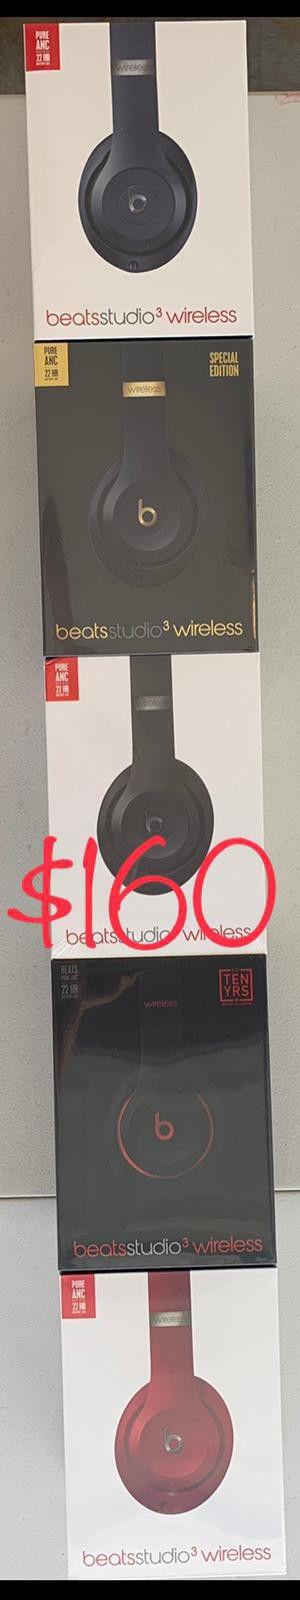 Beat studio 3 authentic headphones wireless brand new sealed box for Sale in Las Vegas, NV